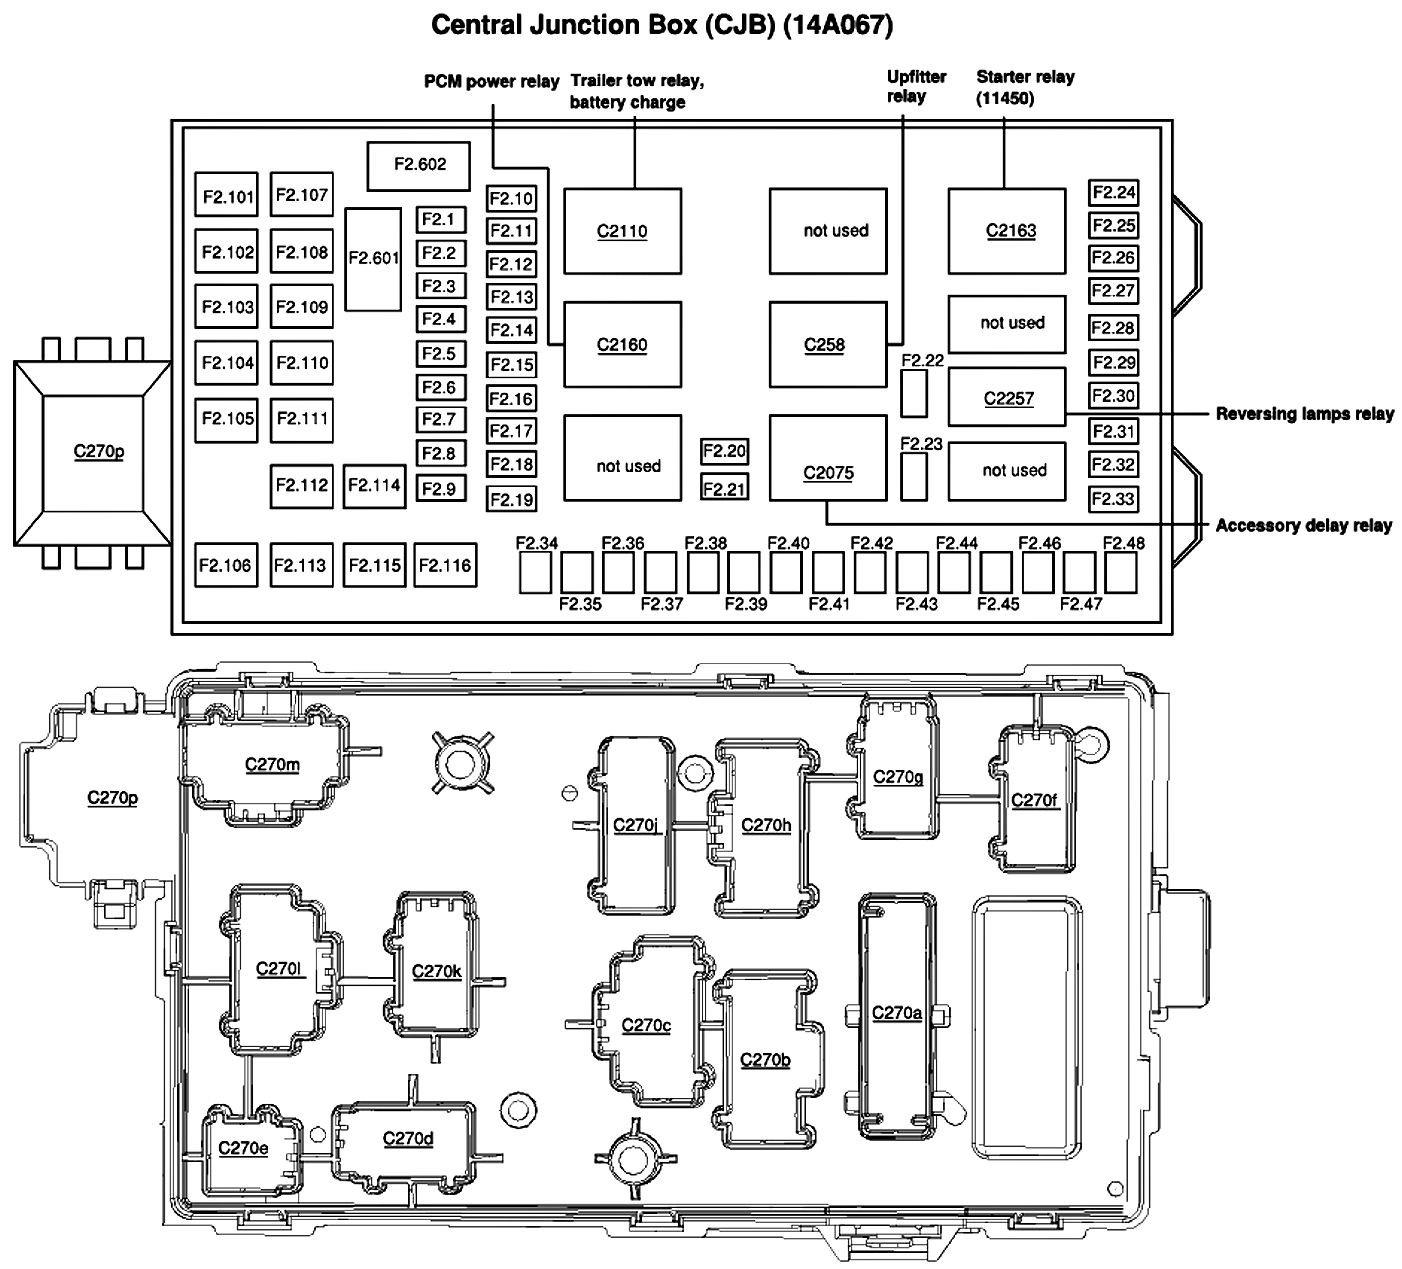 [SCHEMATICS_4PO]  SE_0219] Ford F 250 Fuel Pump Relay Location Wiring Harness Wiring Diagram  Wiring Diagram | Wiring Diagram Fuel Pump Relay Location |  | Orsal Para Isra Mohammedshrine Librar Wiring 101